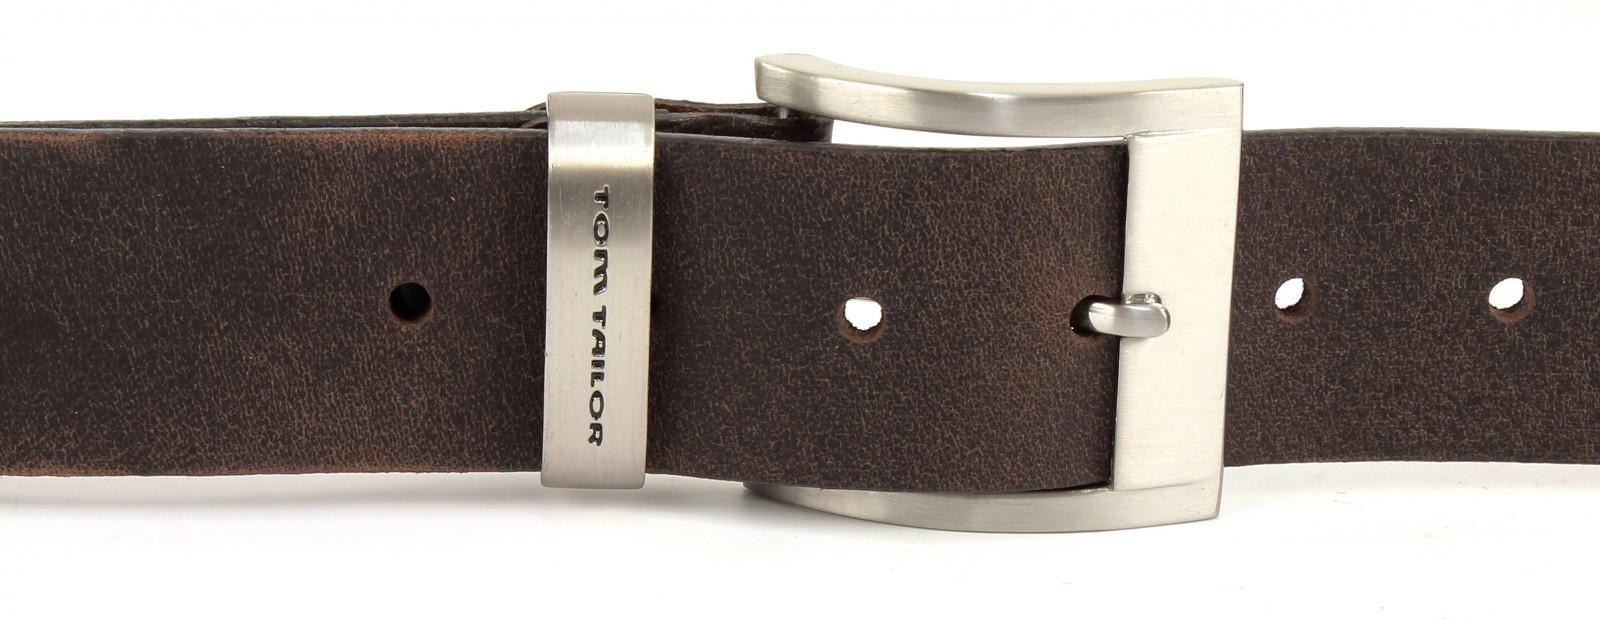 TOM TAILOR Belt TG1165H31 W100 Dark Brown